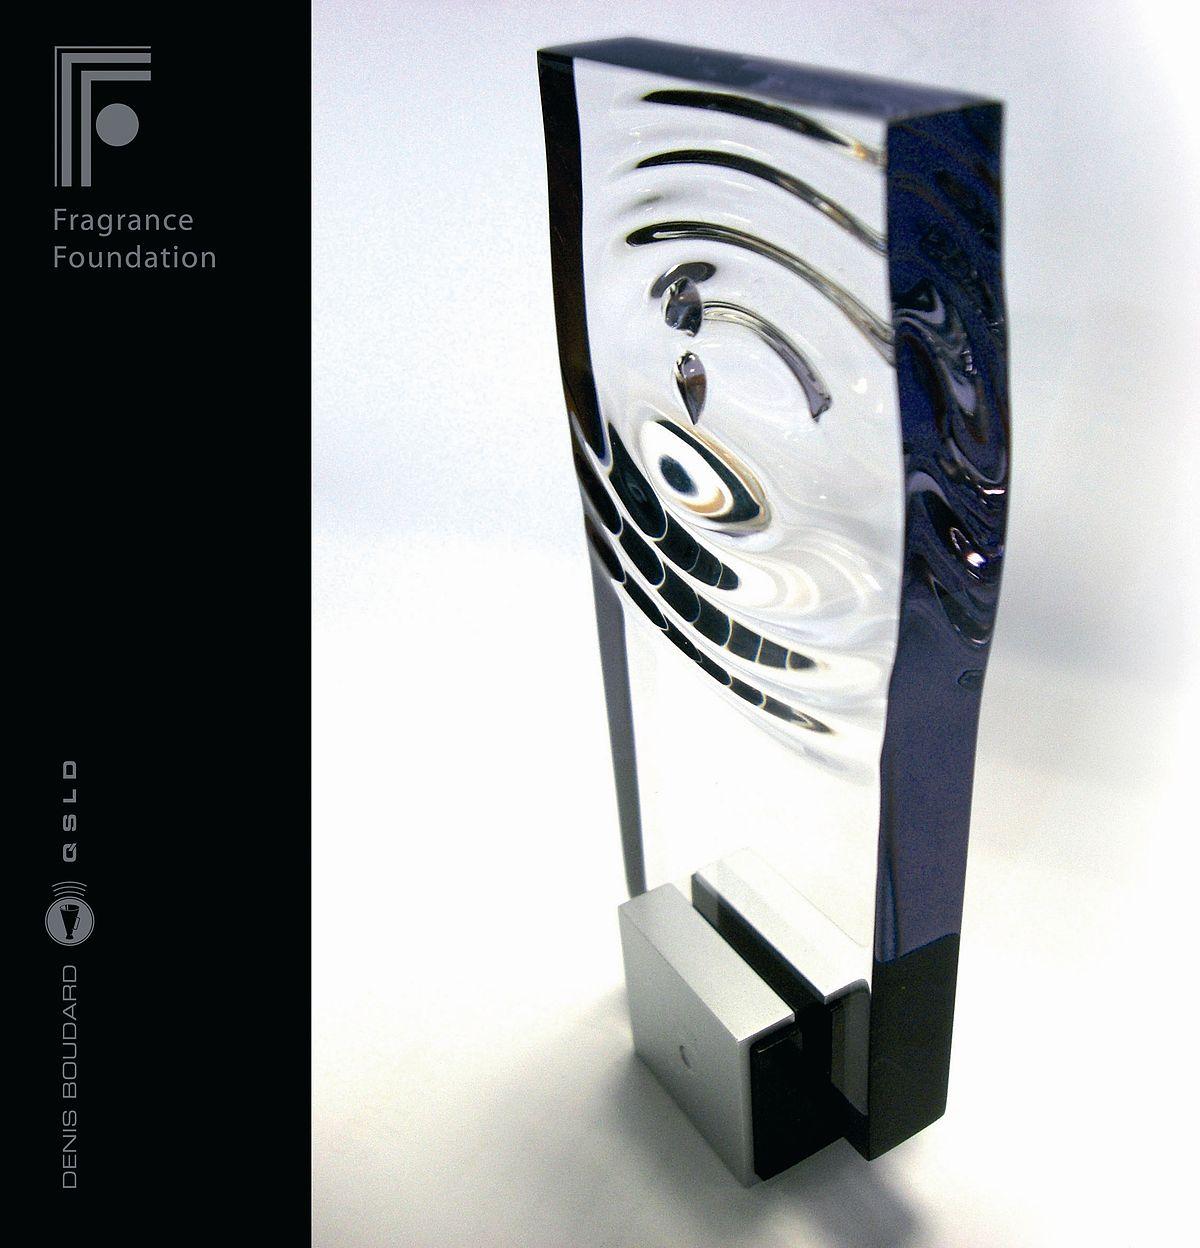 6c56516ac8bd FiFi Awards - Wikipedia